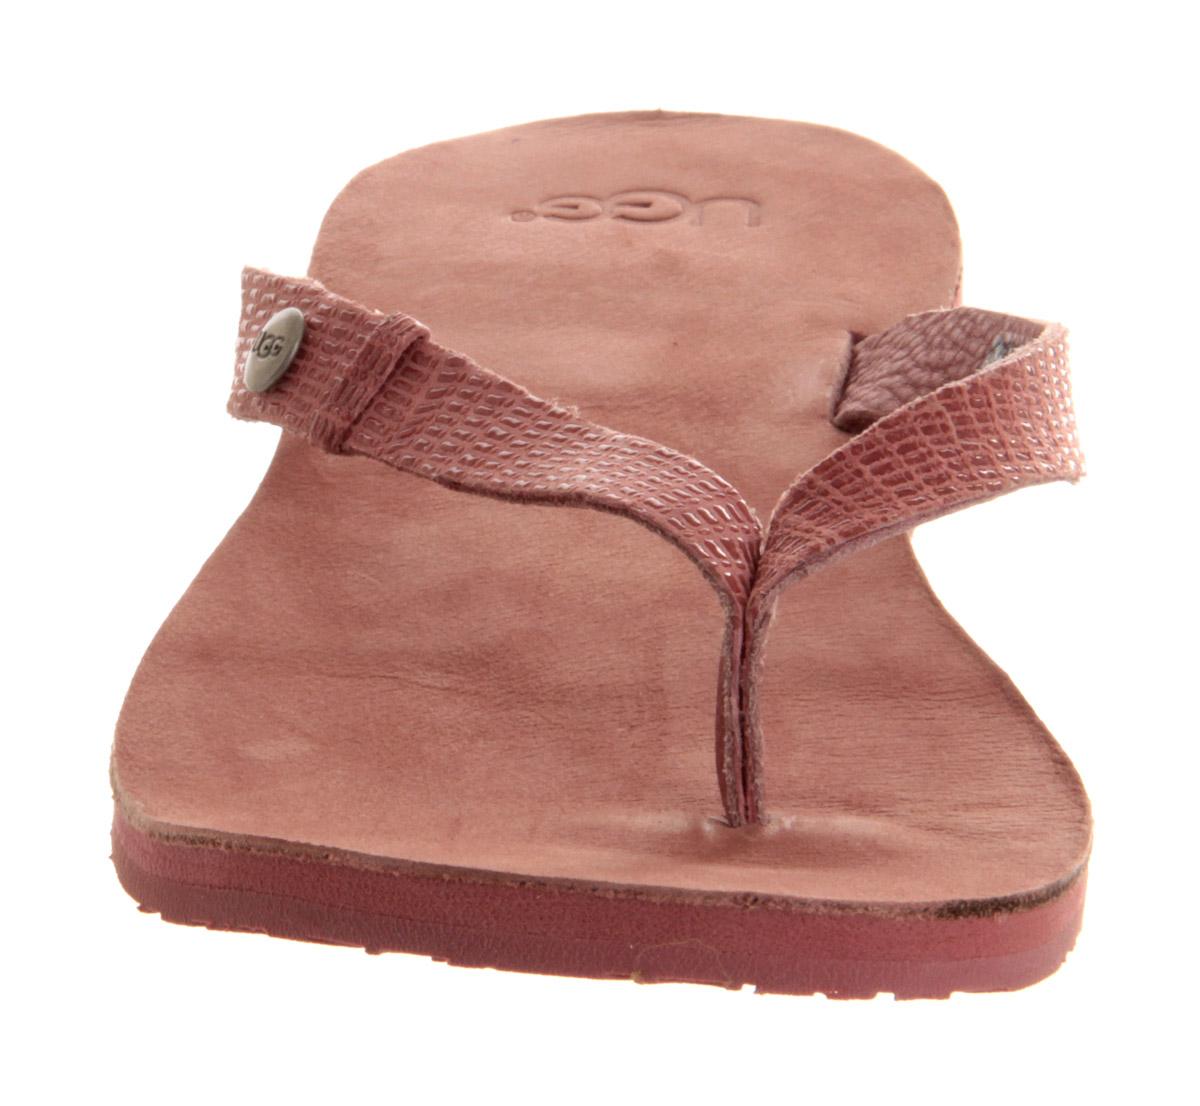 Lyst - Ugg Ally Flip Flop In Pink-6426